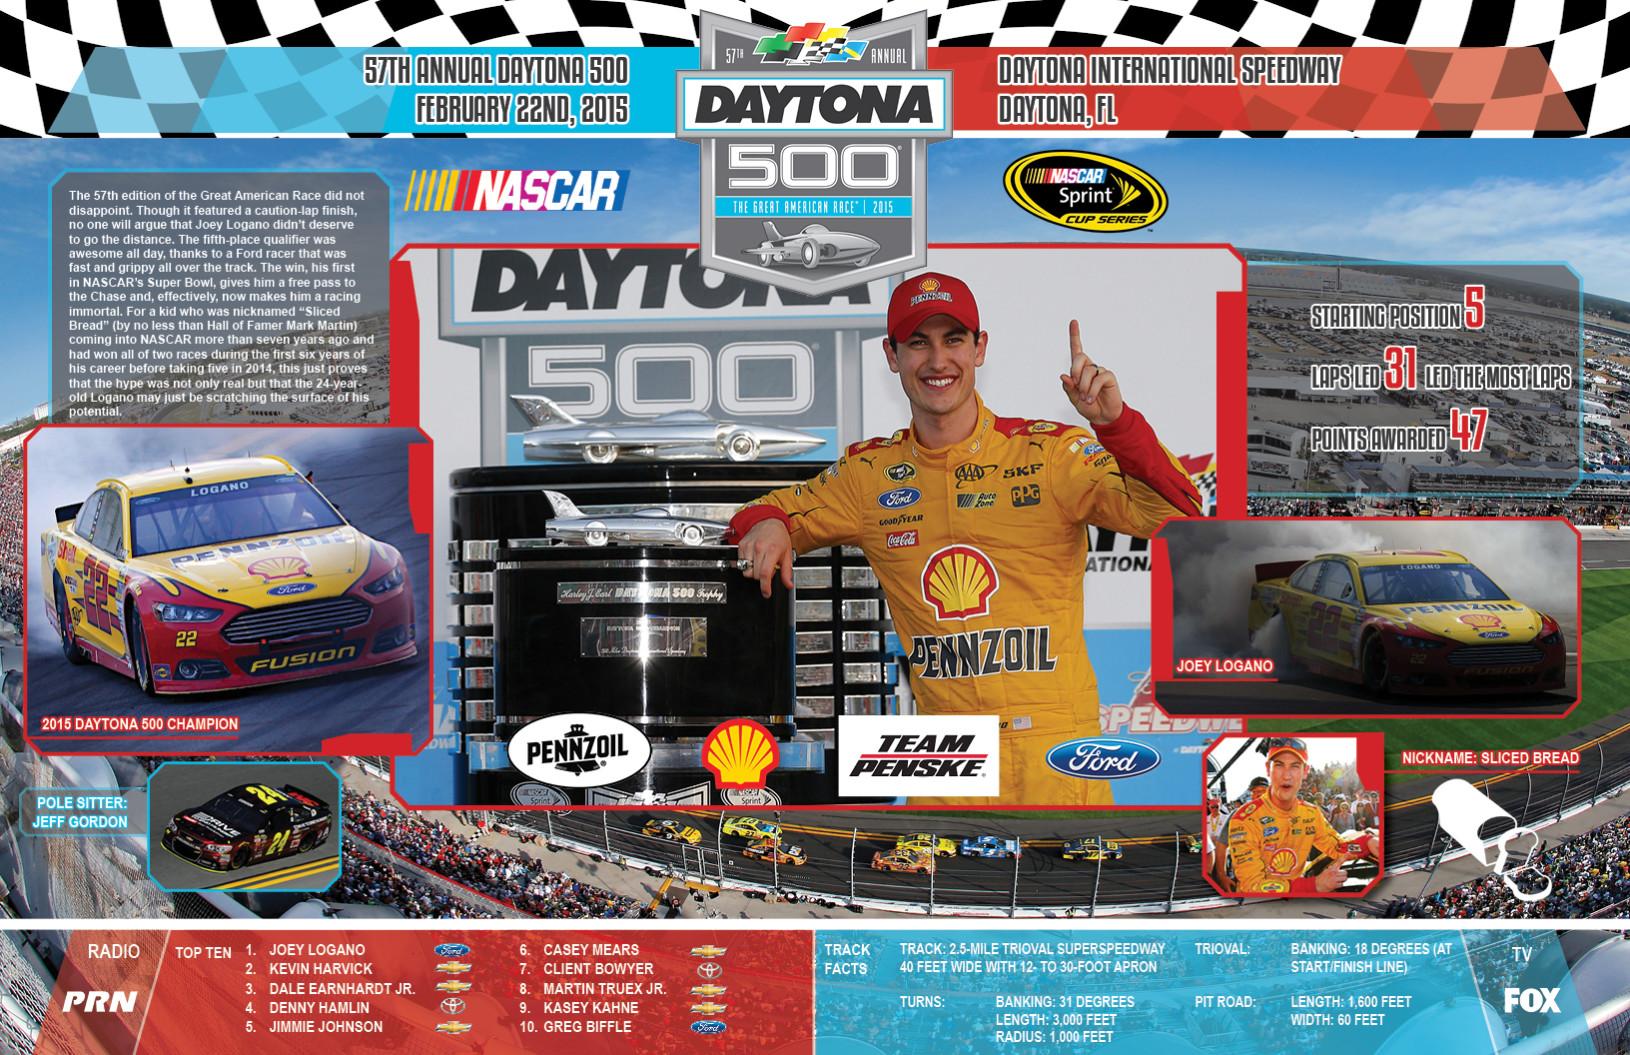 2015 Daytona 500 Infographic